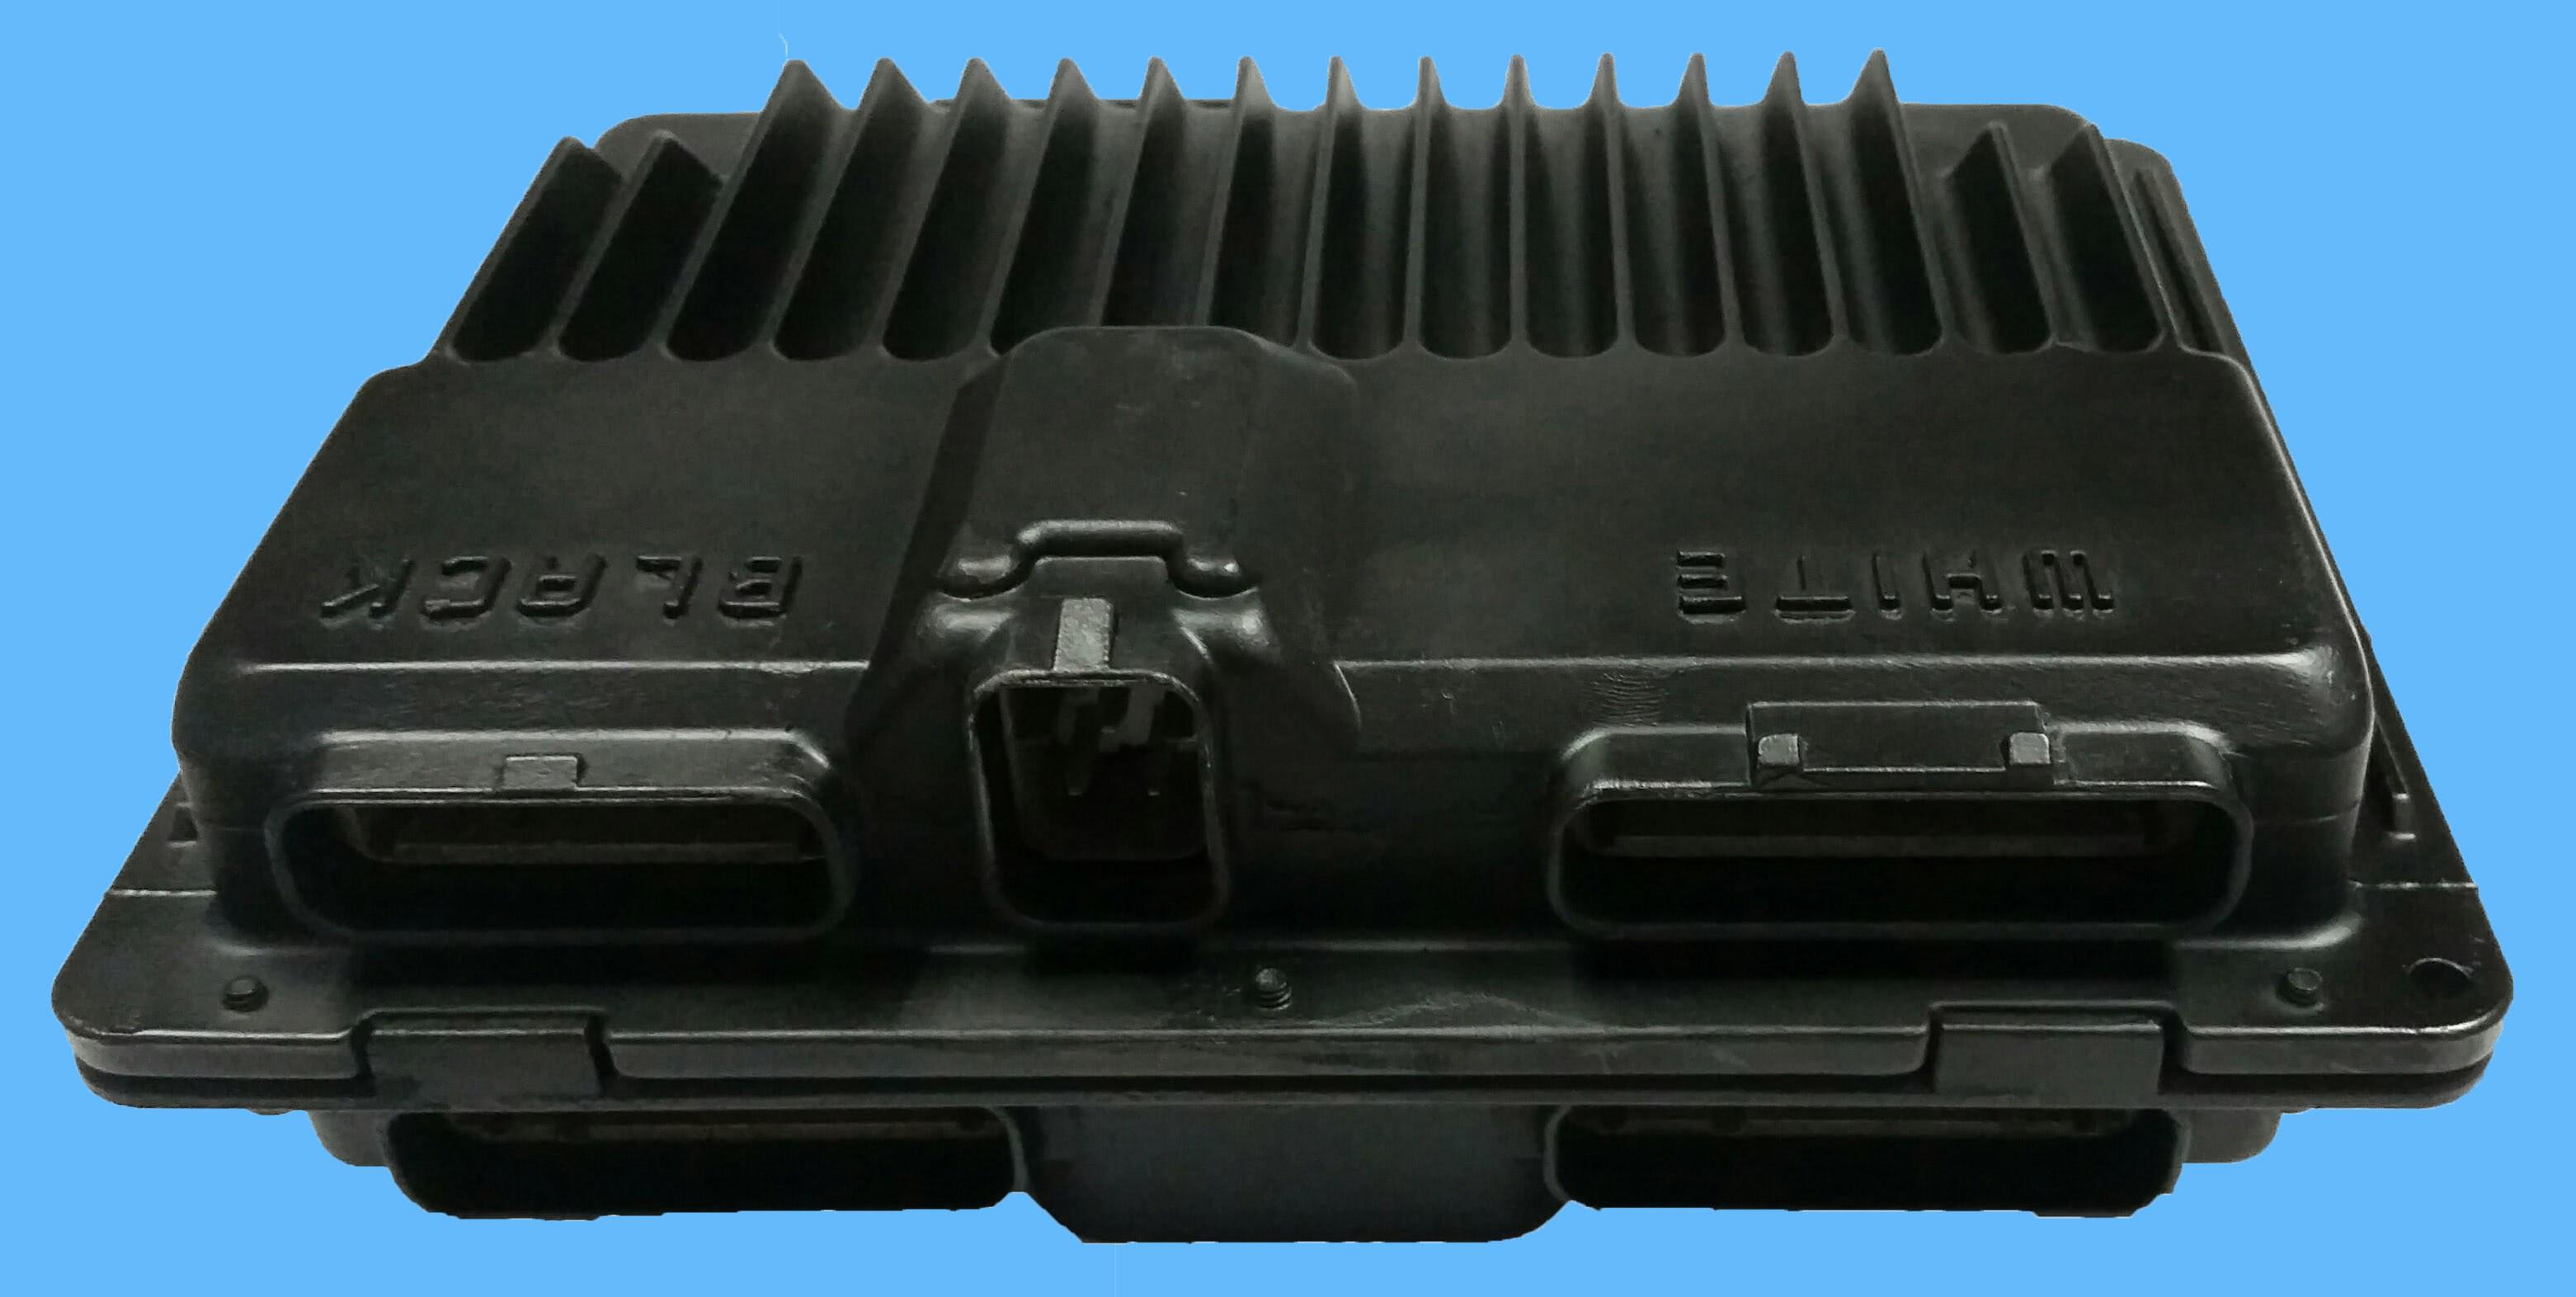 1999 Chevrolet Suburban 7.4L V8 Gas Engine Control Module ECM / ECU - Engine Control Module